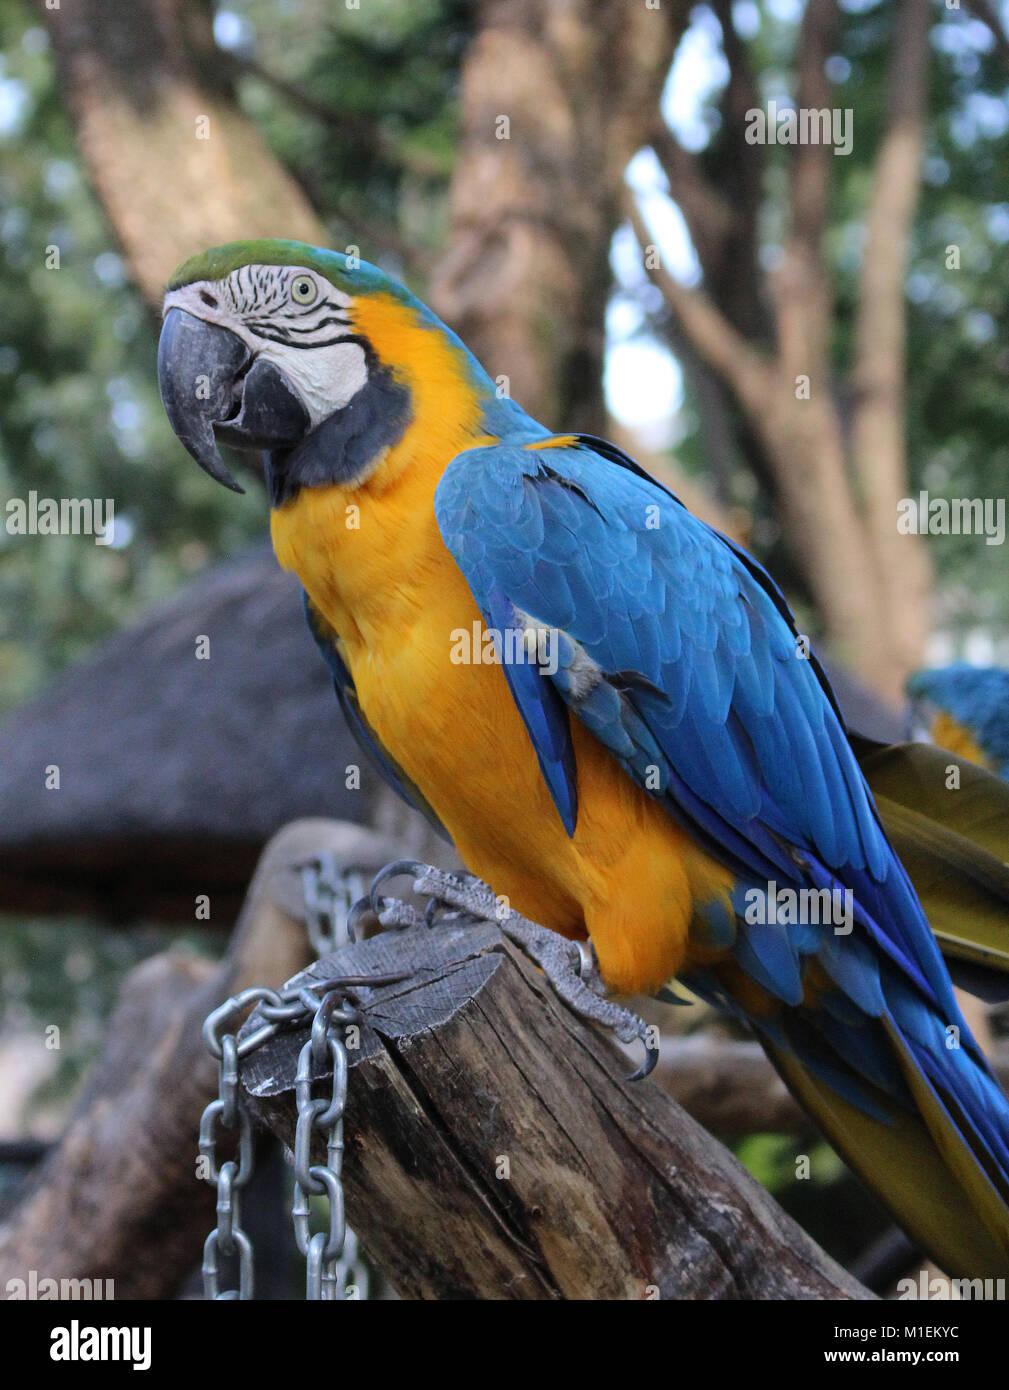 Blue-and-yellow Macaw (Ara ararauna) Photo Stock